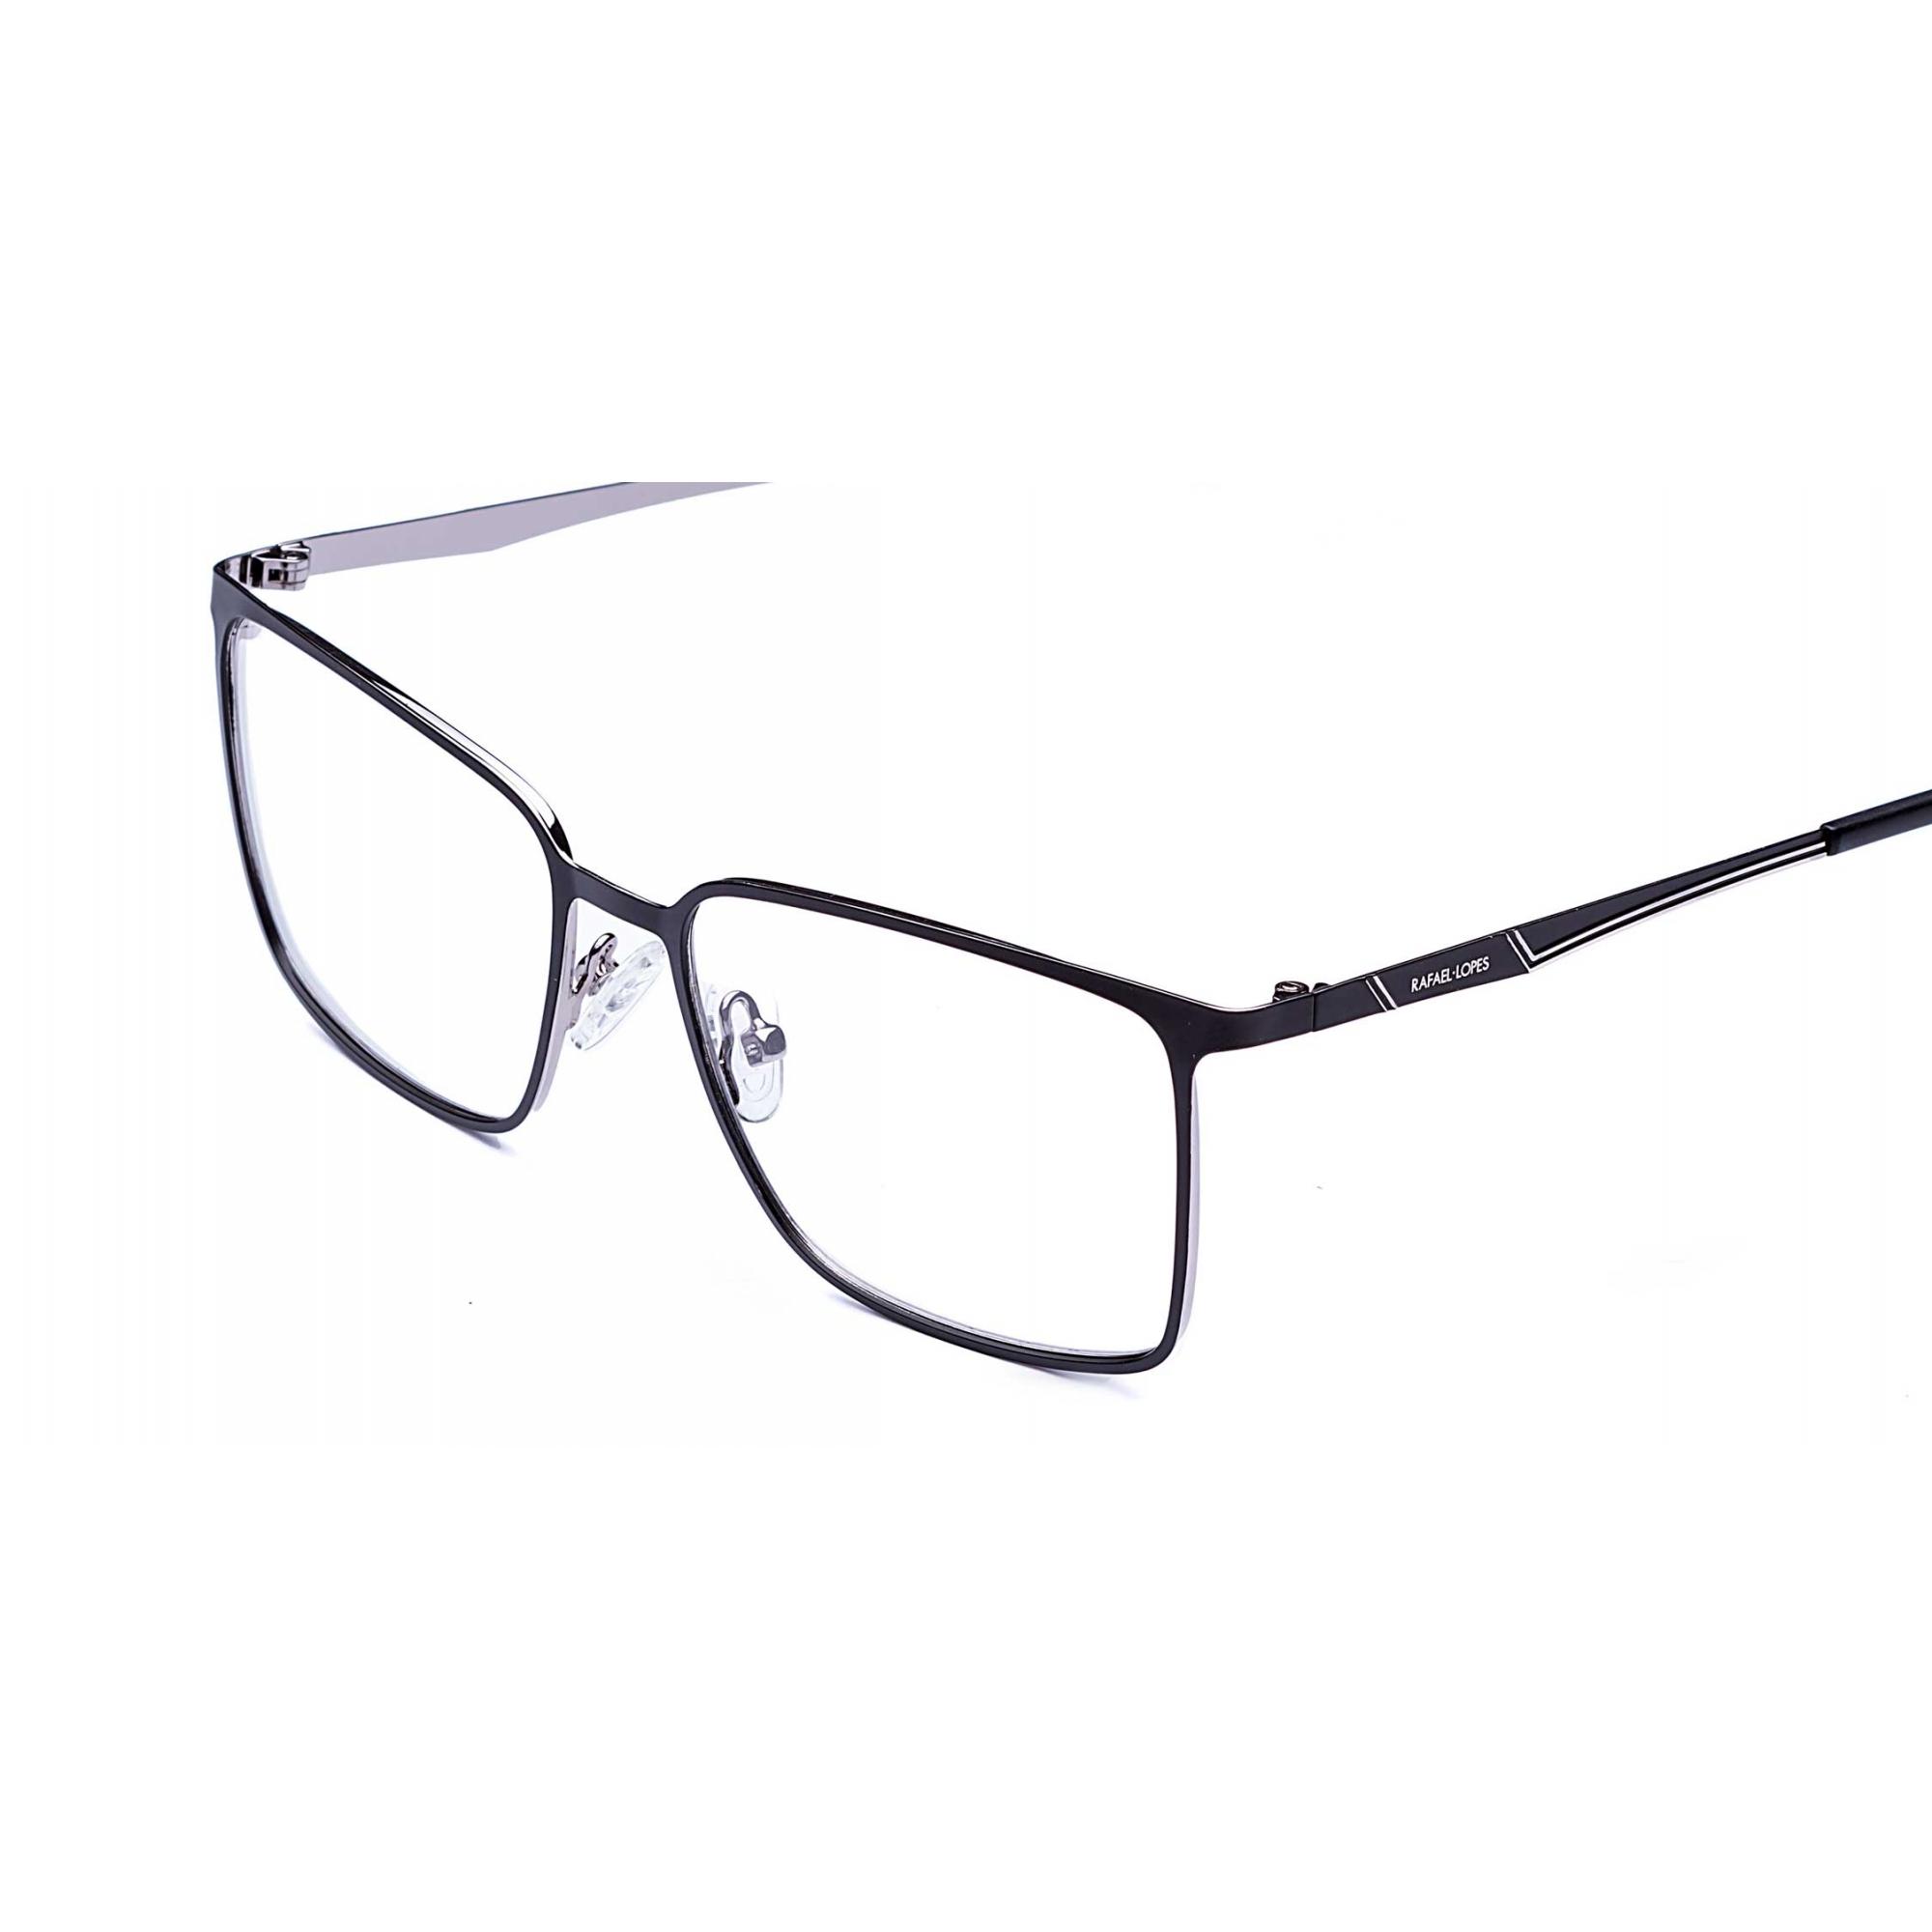 Óculos de Grau Madrid Rafael Lopes Eyewear